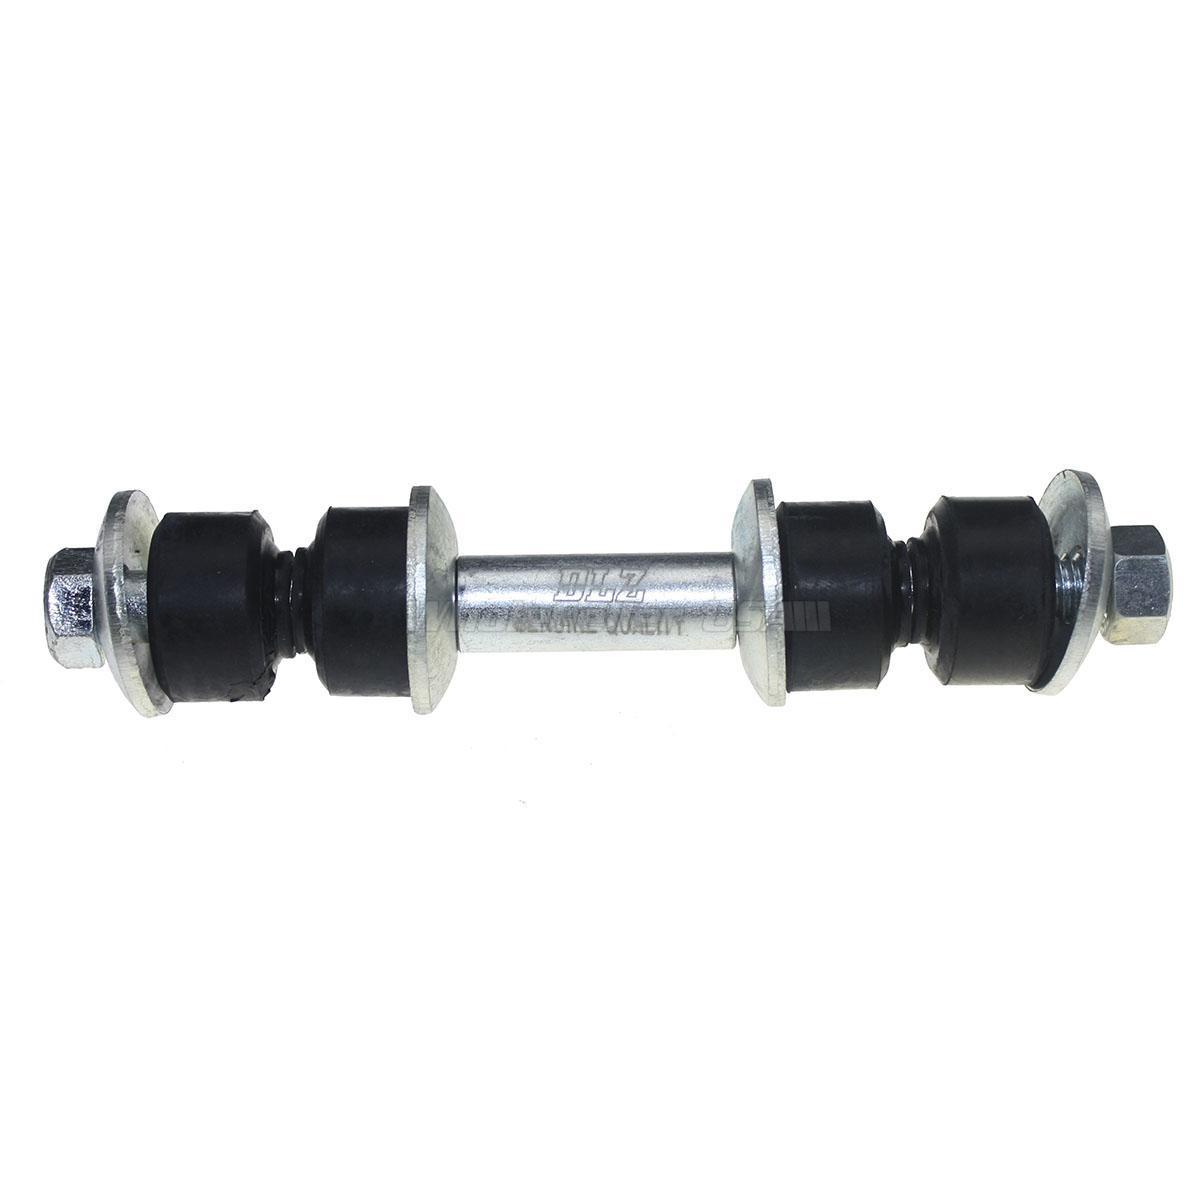 8 Pcs DLZ Suspension Ball Joint Tie Rod End For 1989-1995